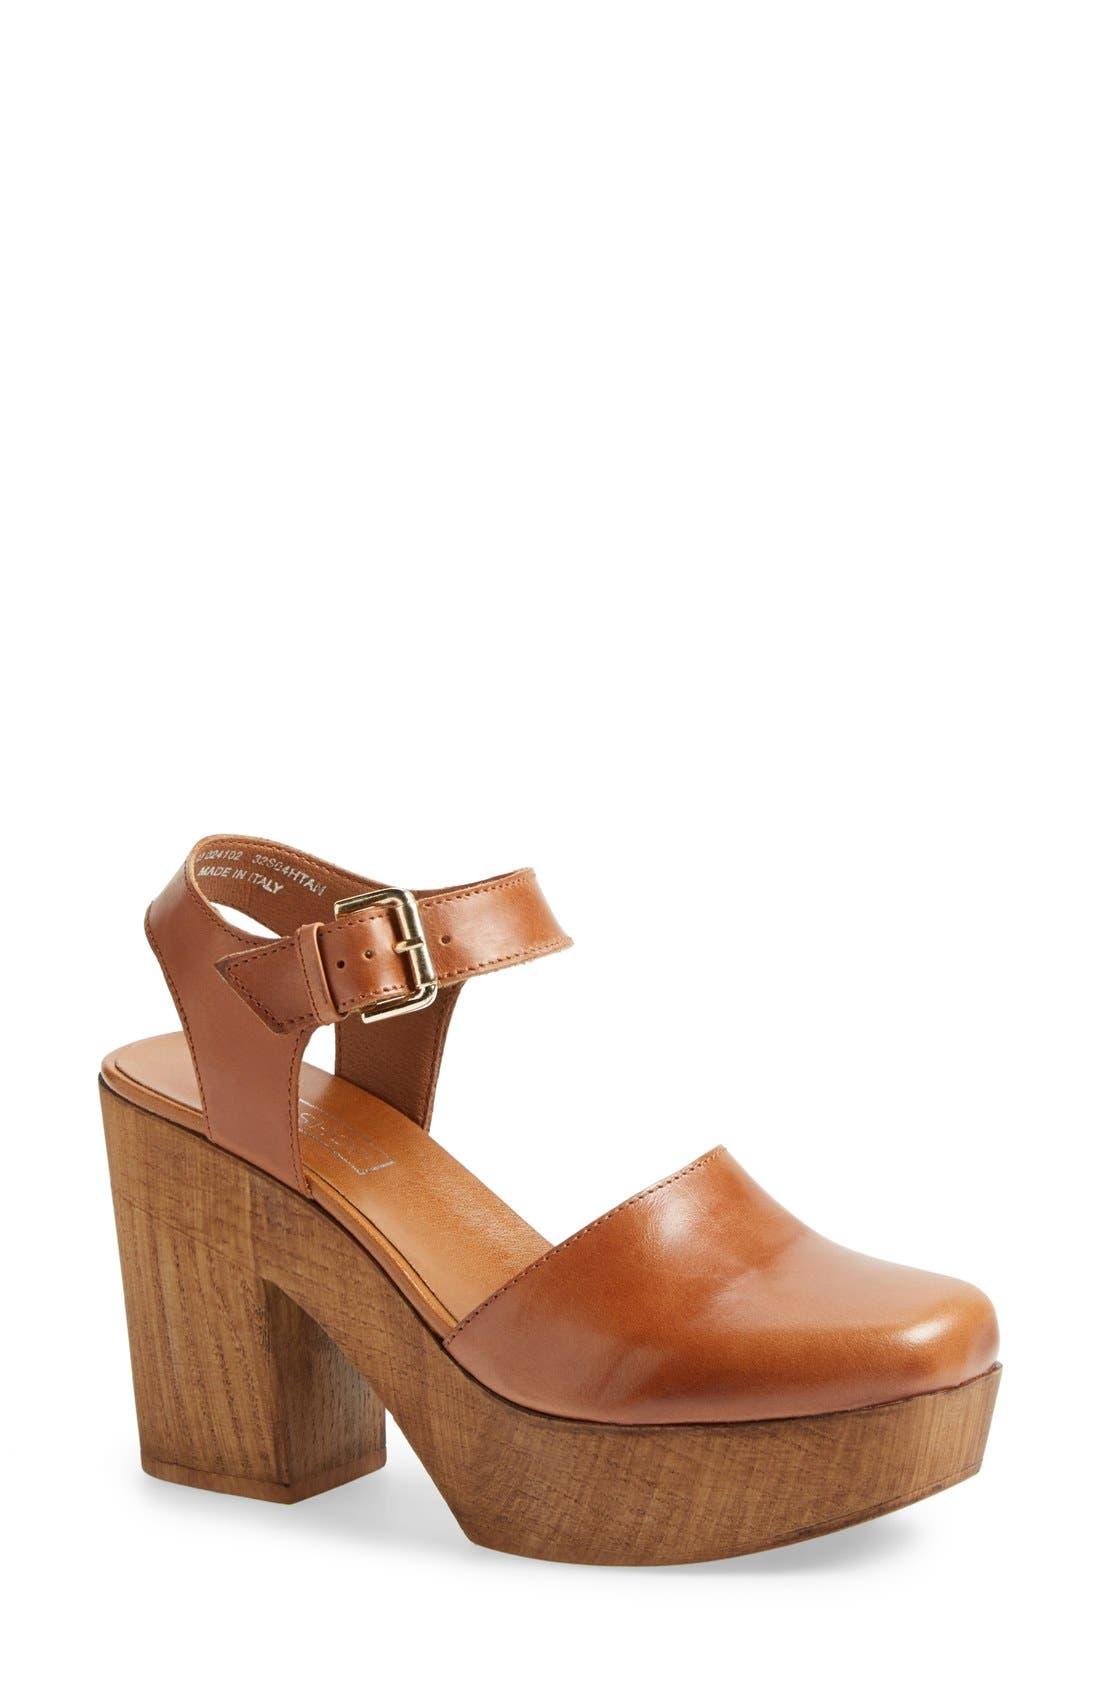 Main Image - Topshop 'Smile' Wooden Platform Leather Sandal (Women)